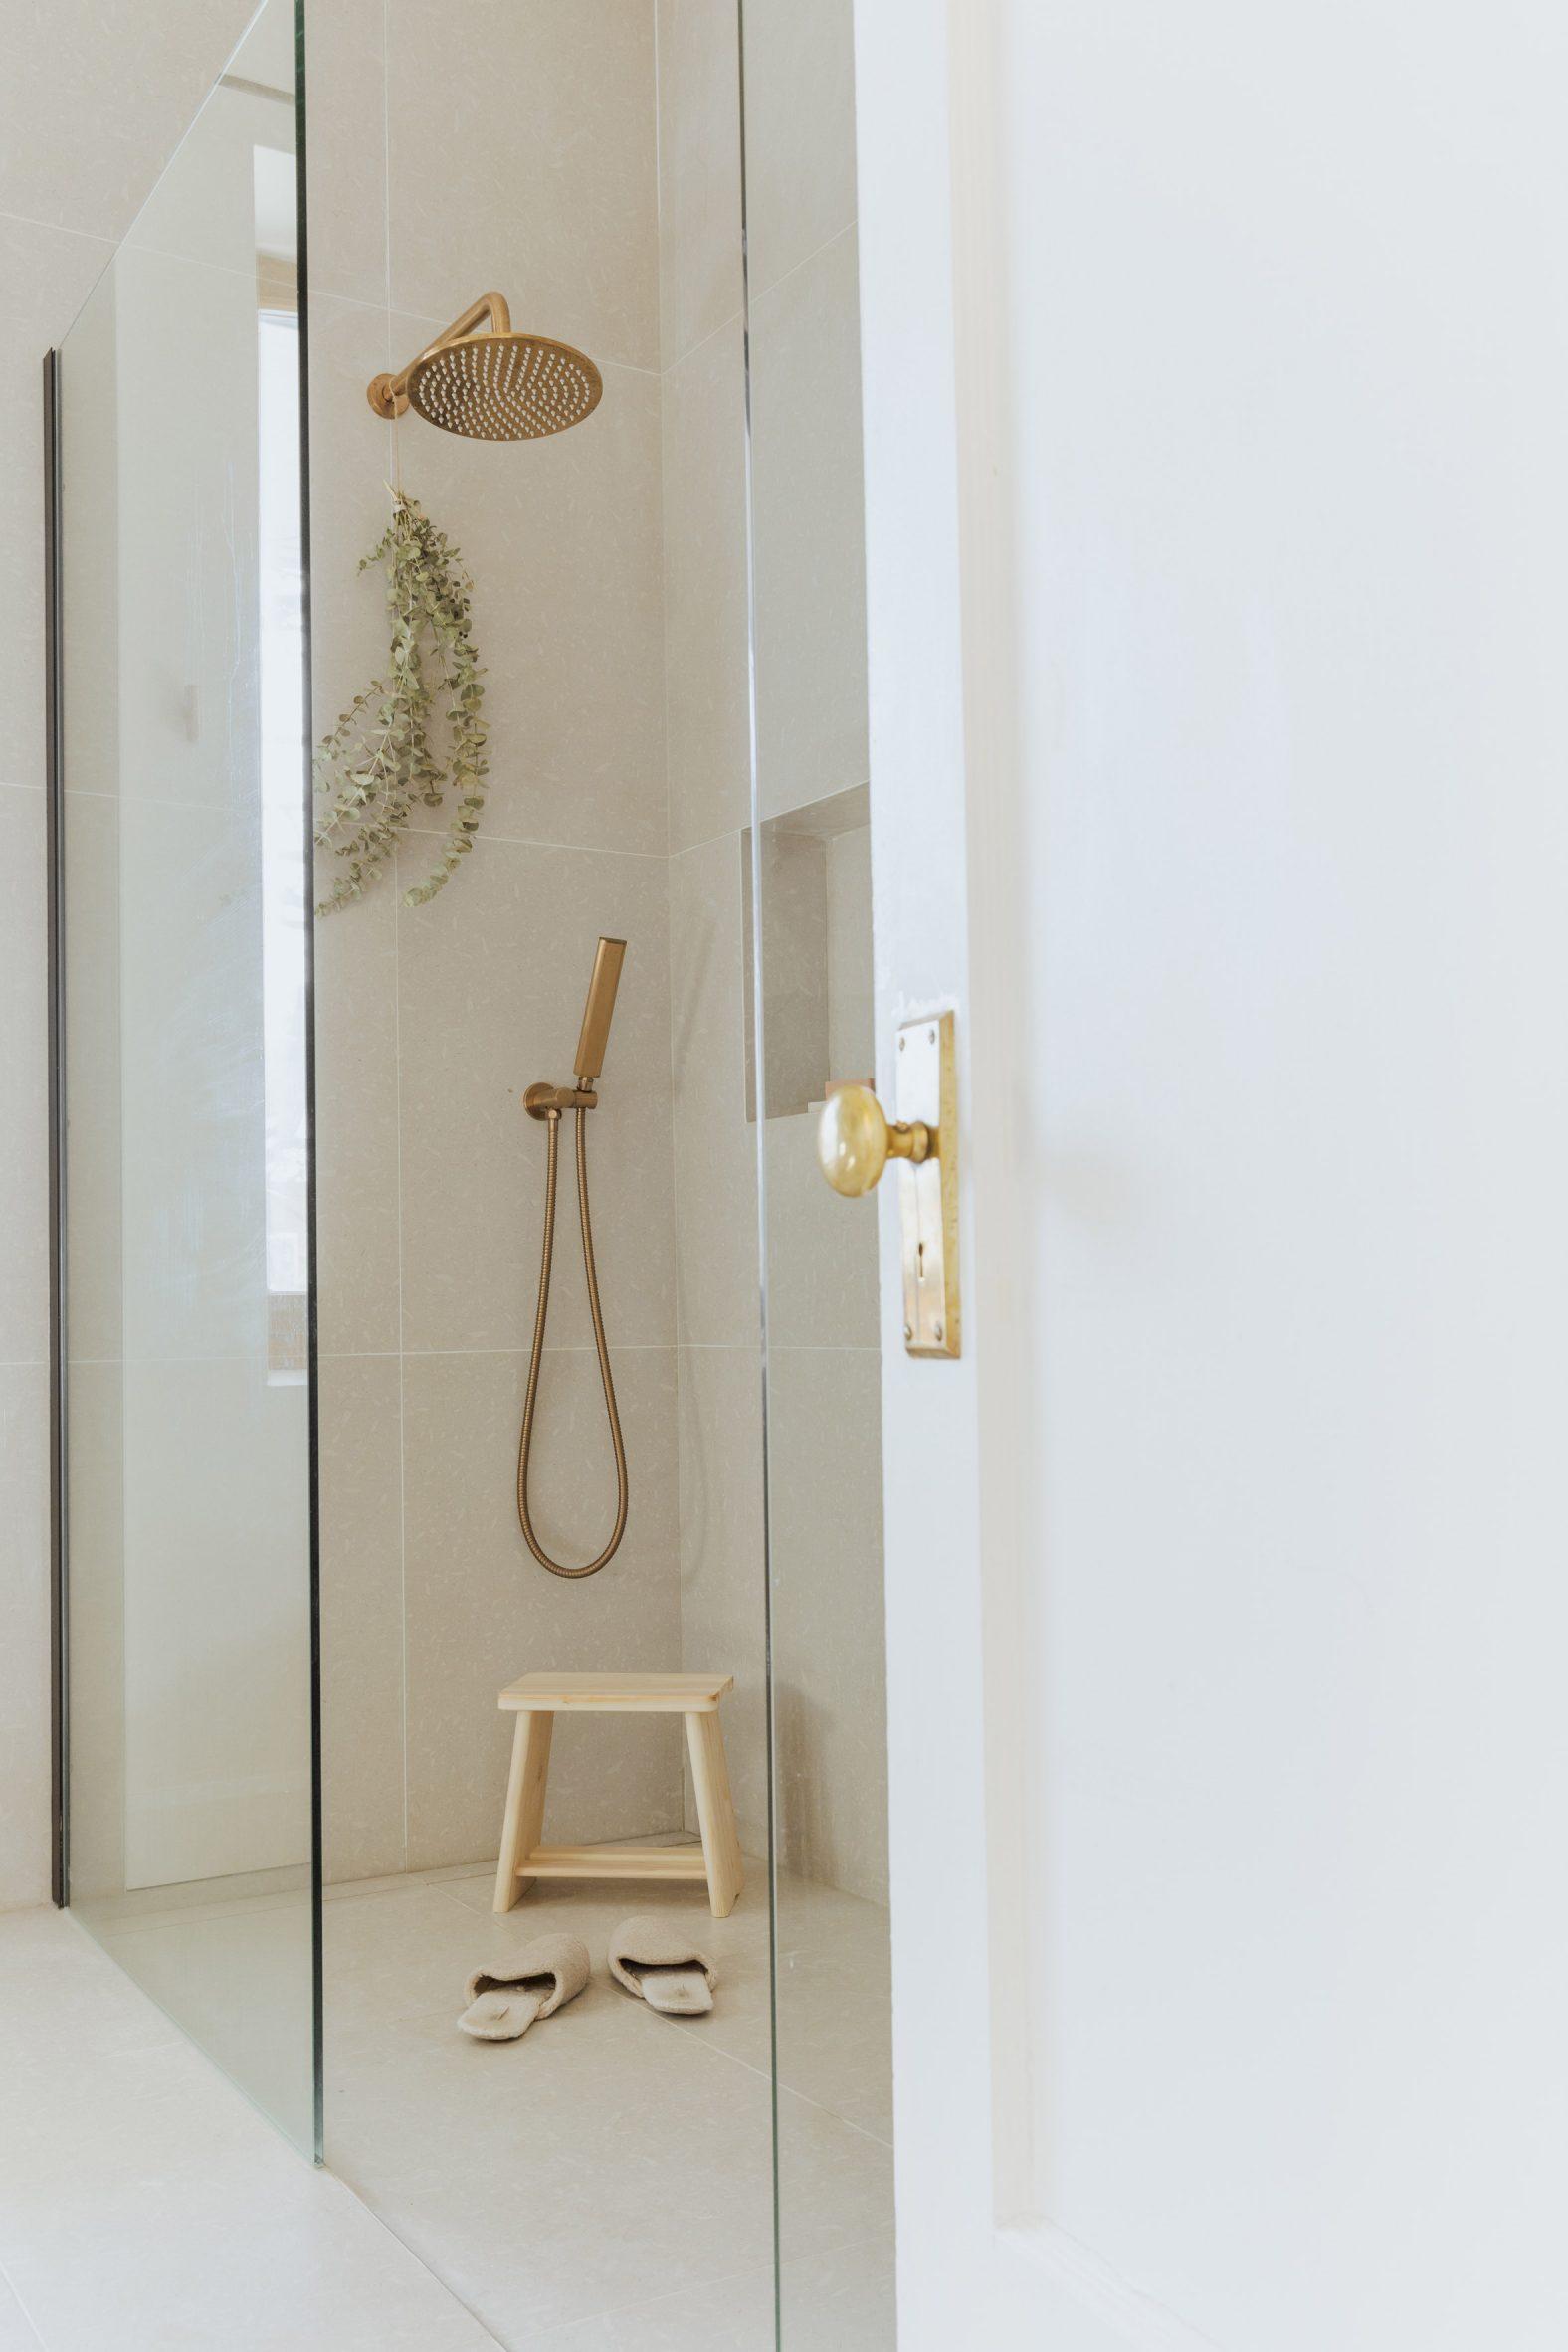 Bathroom renovation shower tile Montreal